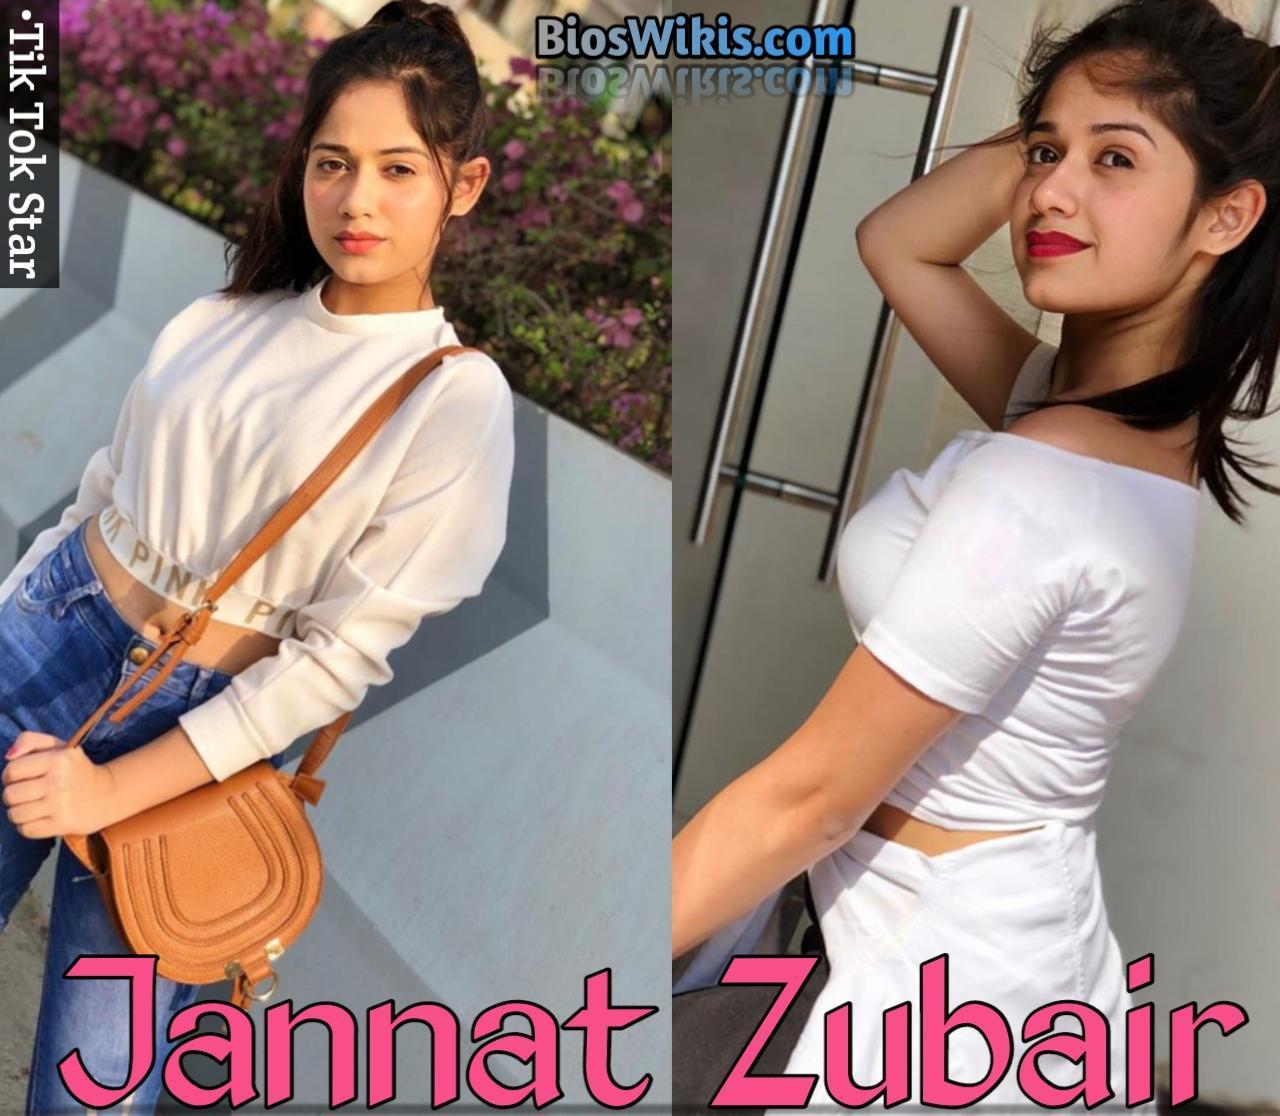 Jannat Zubair Rahmani images